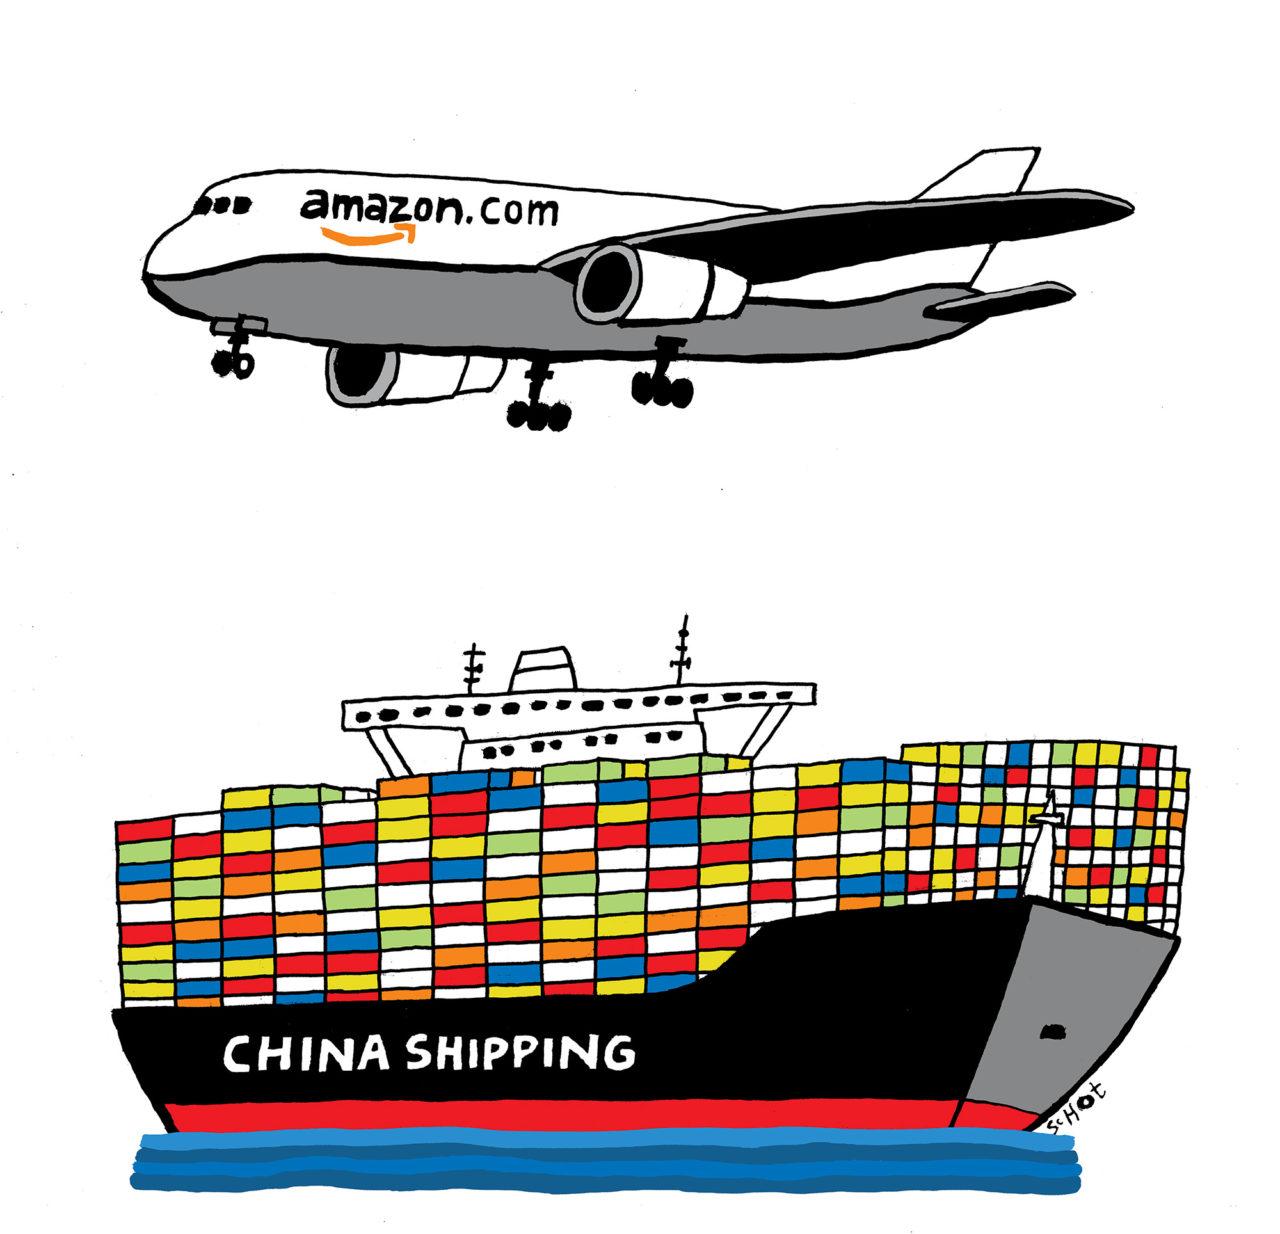 em-containers-vervoer-amazon